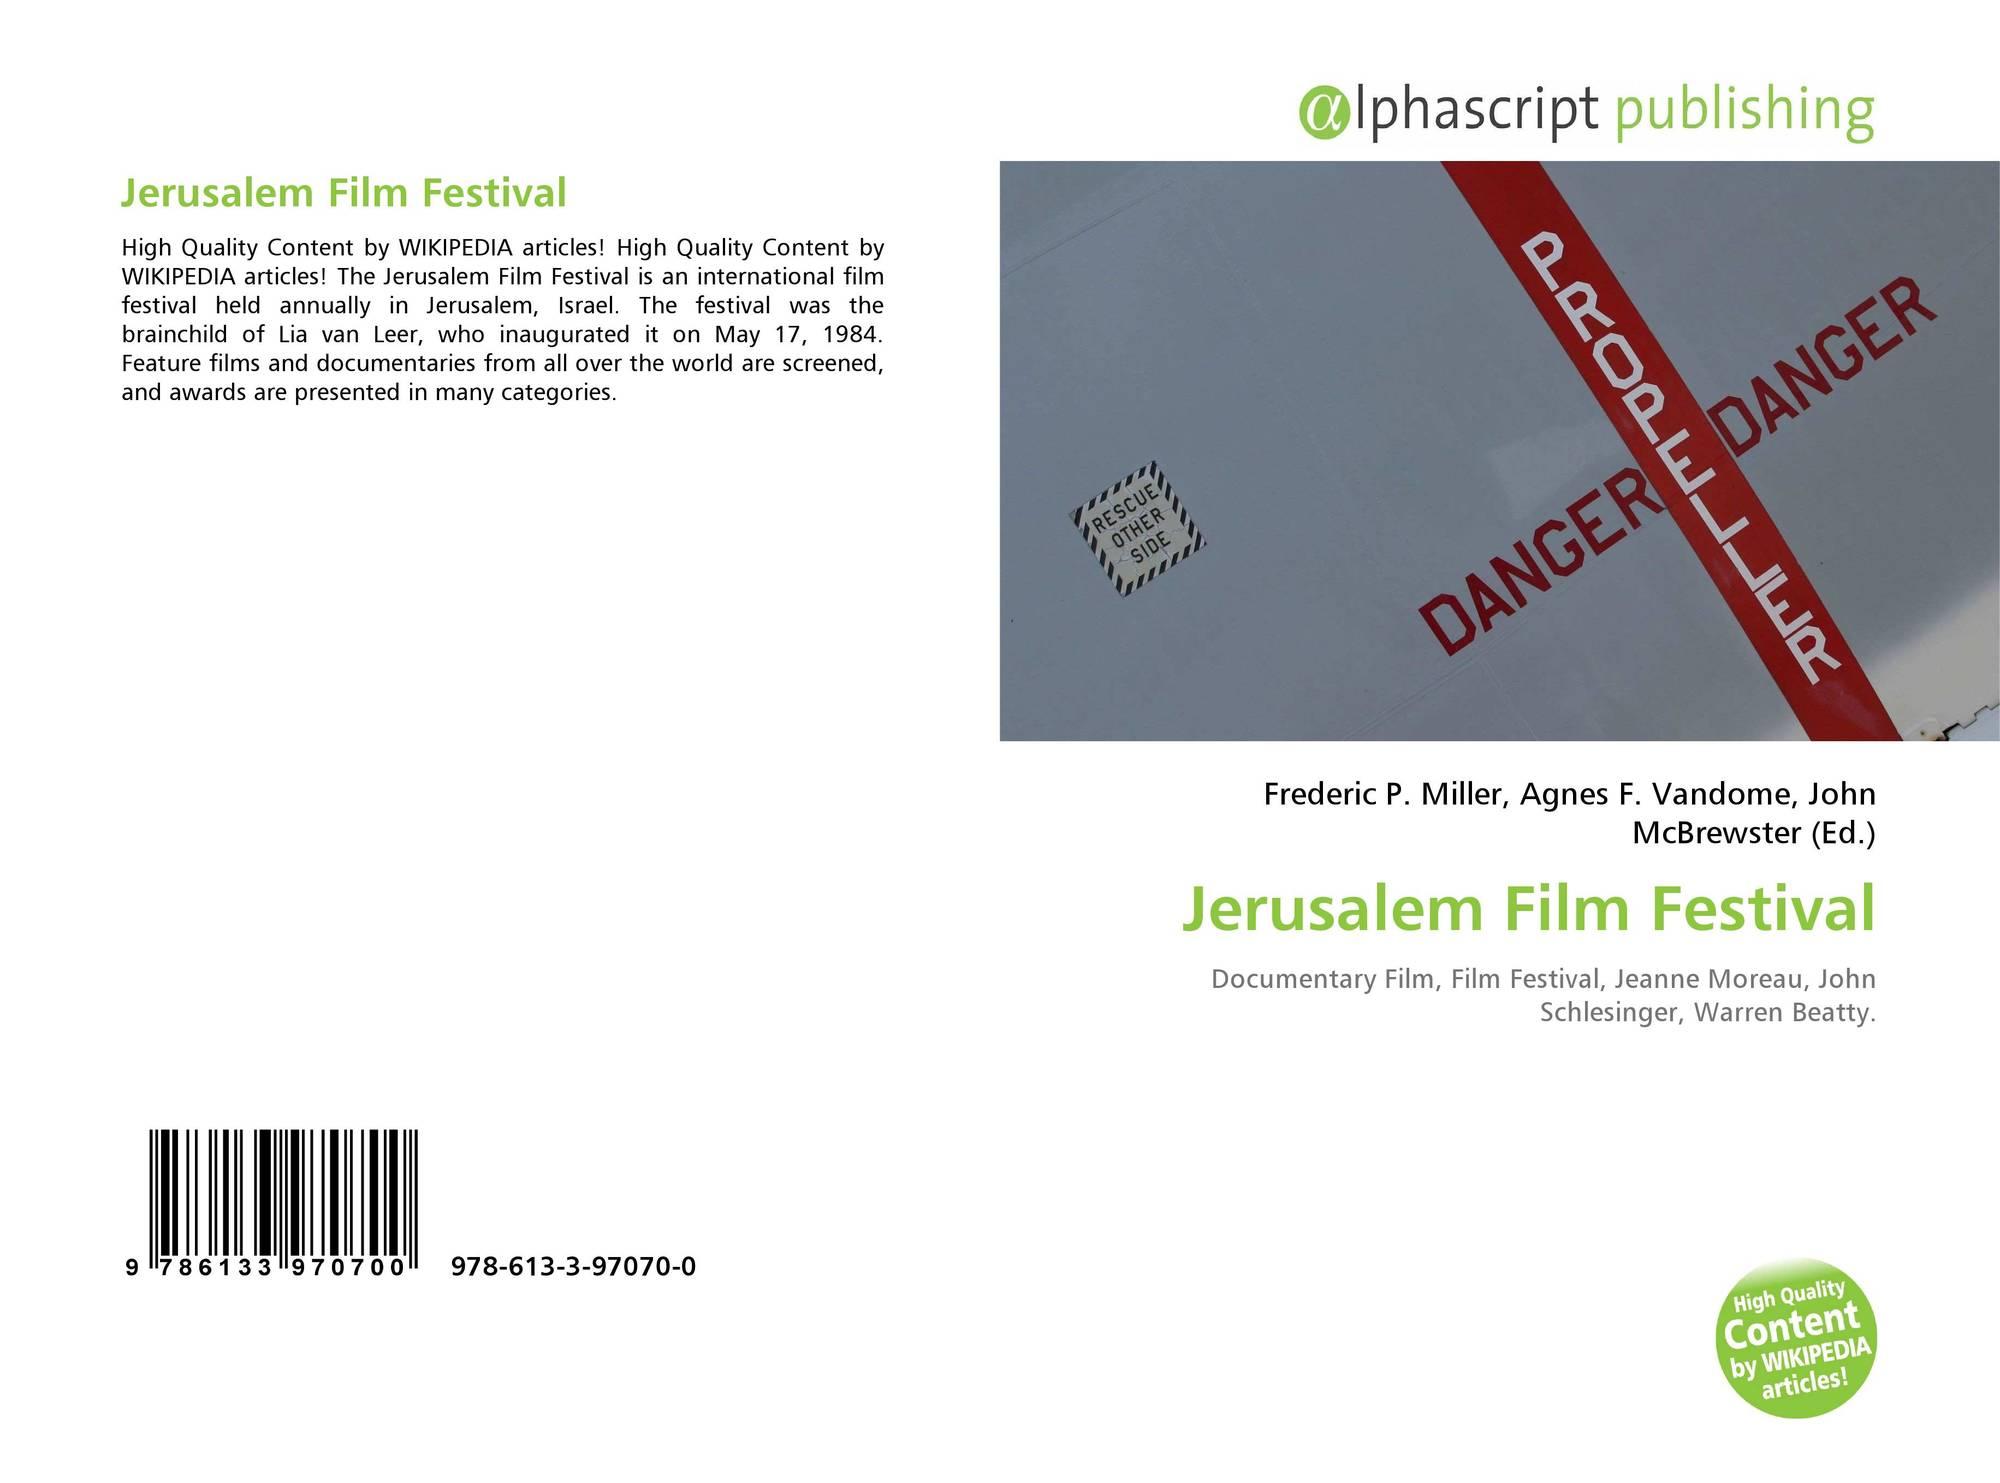 Jerusalem Film Festival, 978-613-3-97070-0, 6133970707 ,9786133970700